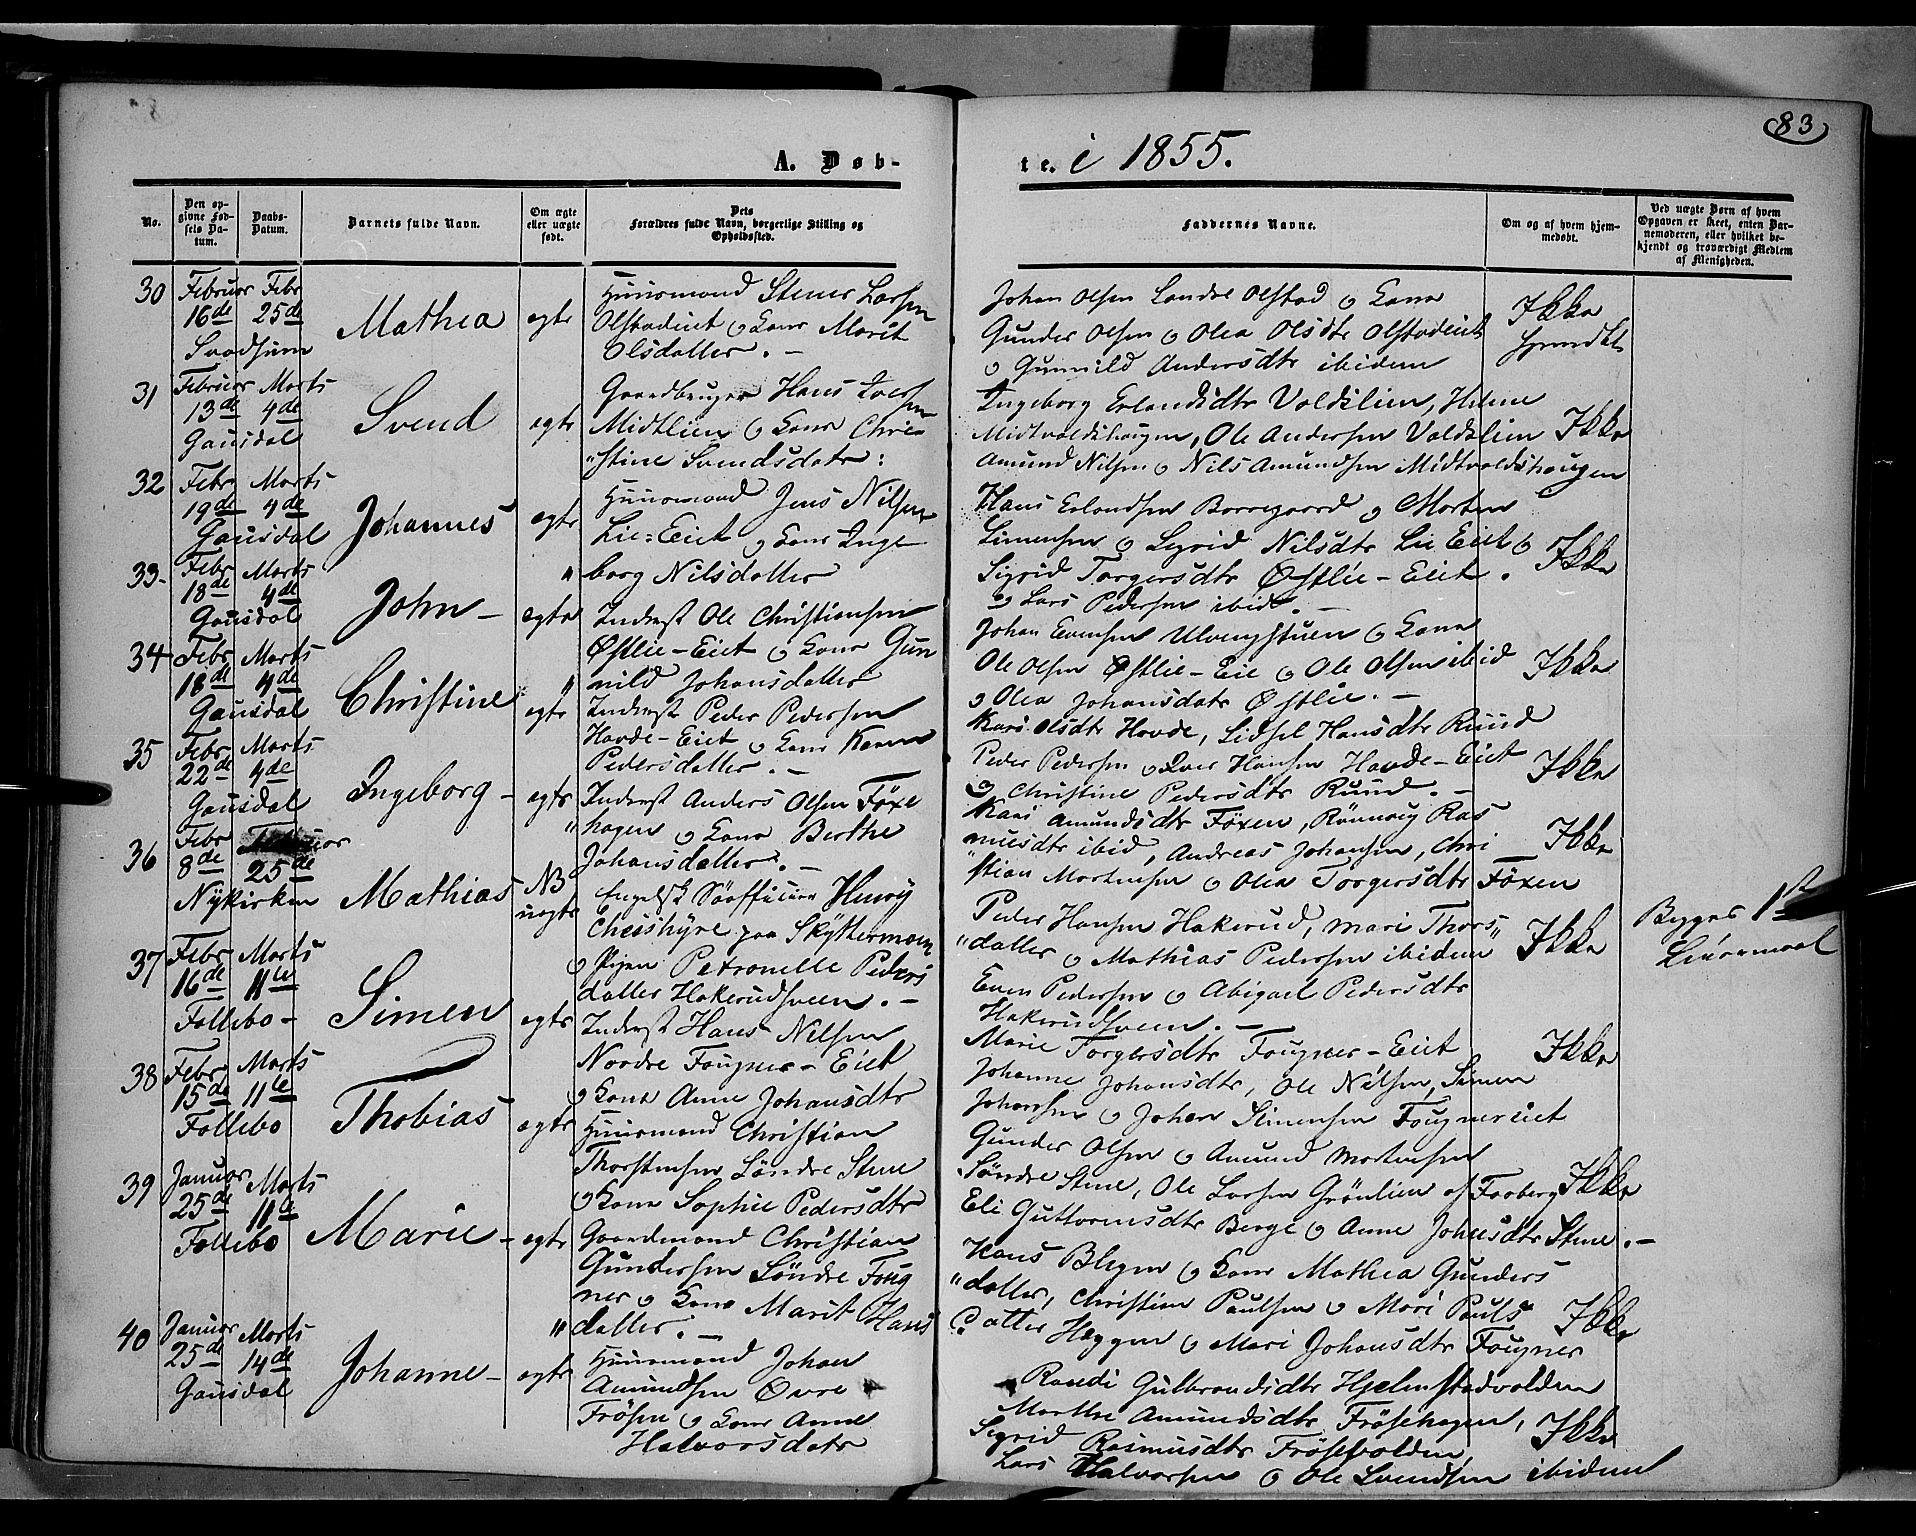 SAH, Gausdal prestekontor, Ministerialbok nr. 8, 1850-1861, s. 83